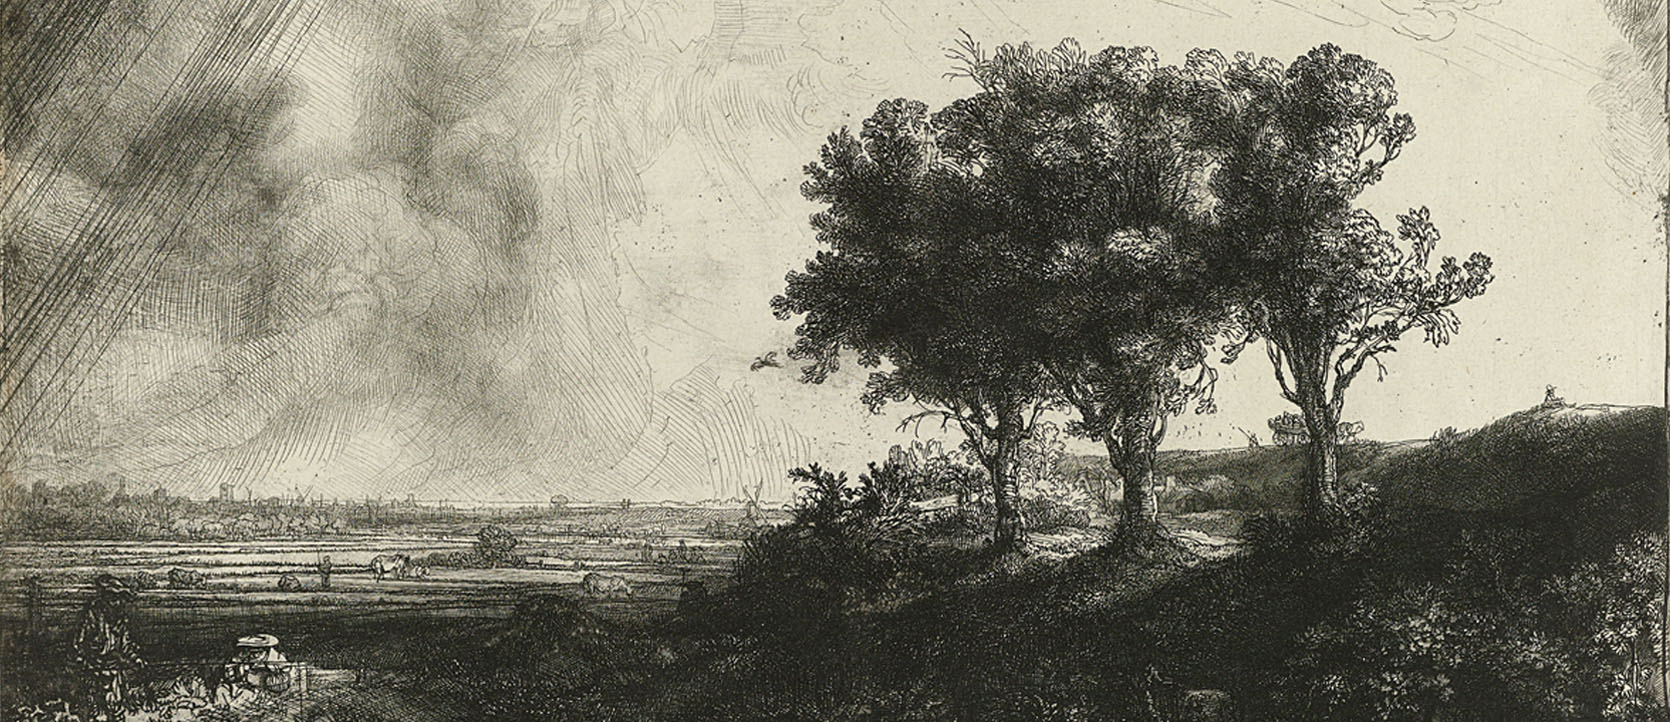 Rembrandt-van-Rijn-De-drie-bomen-1643-sl